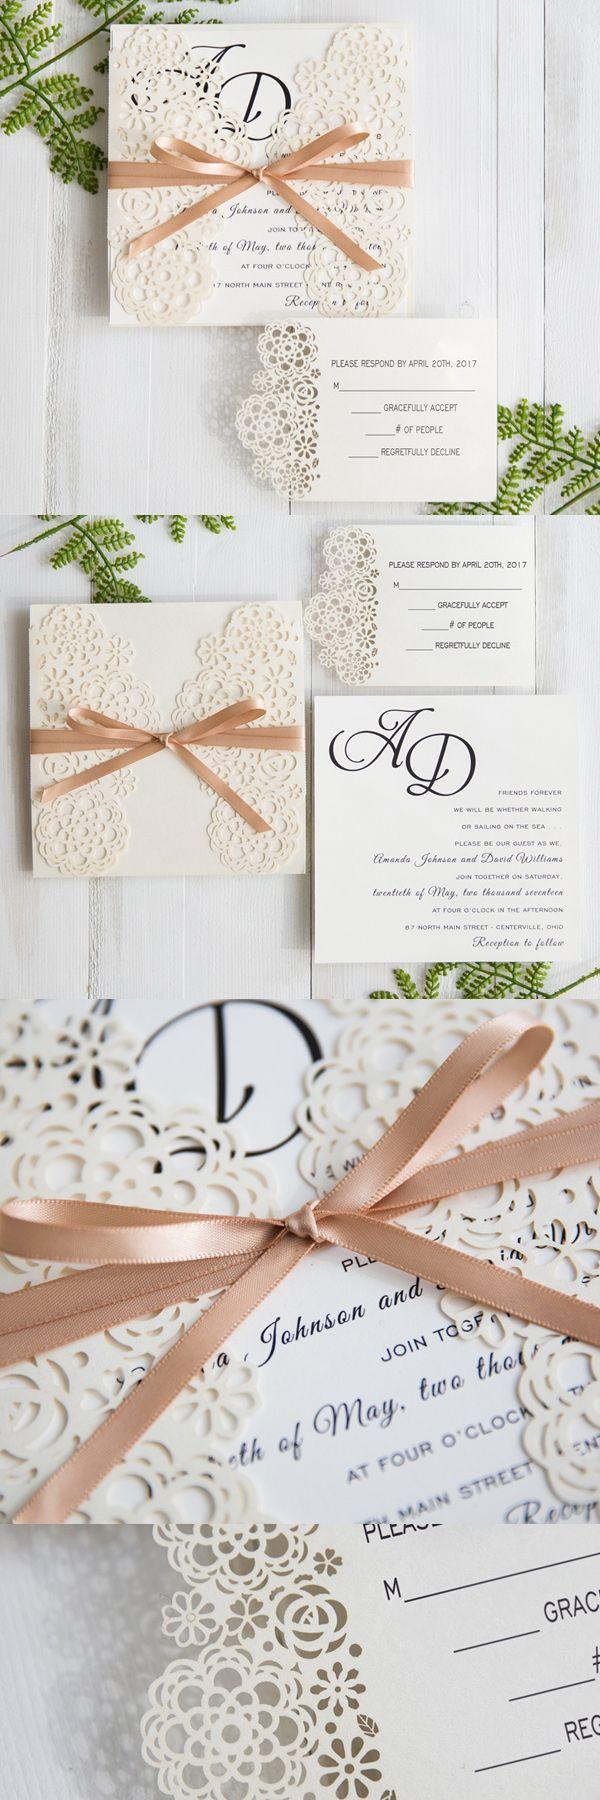 modern floral laser cut wedding invitations with